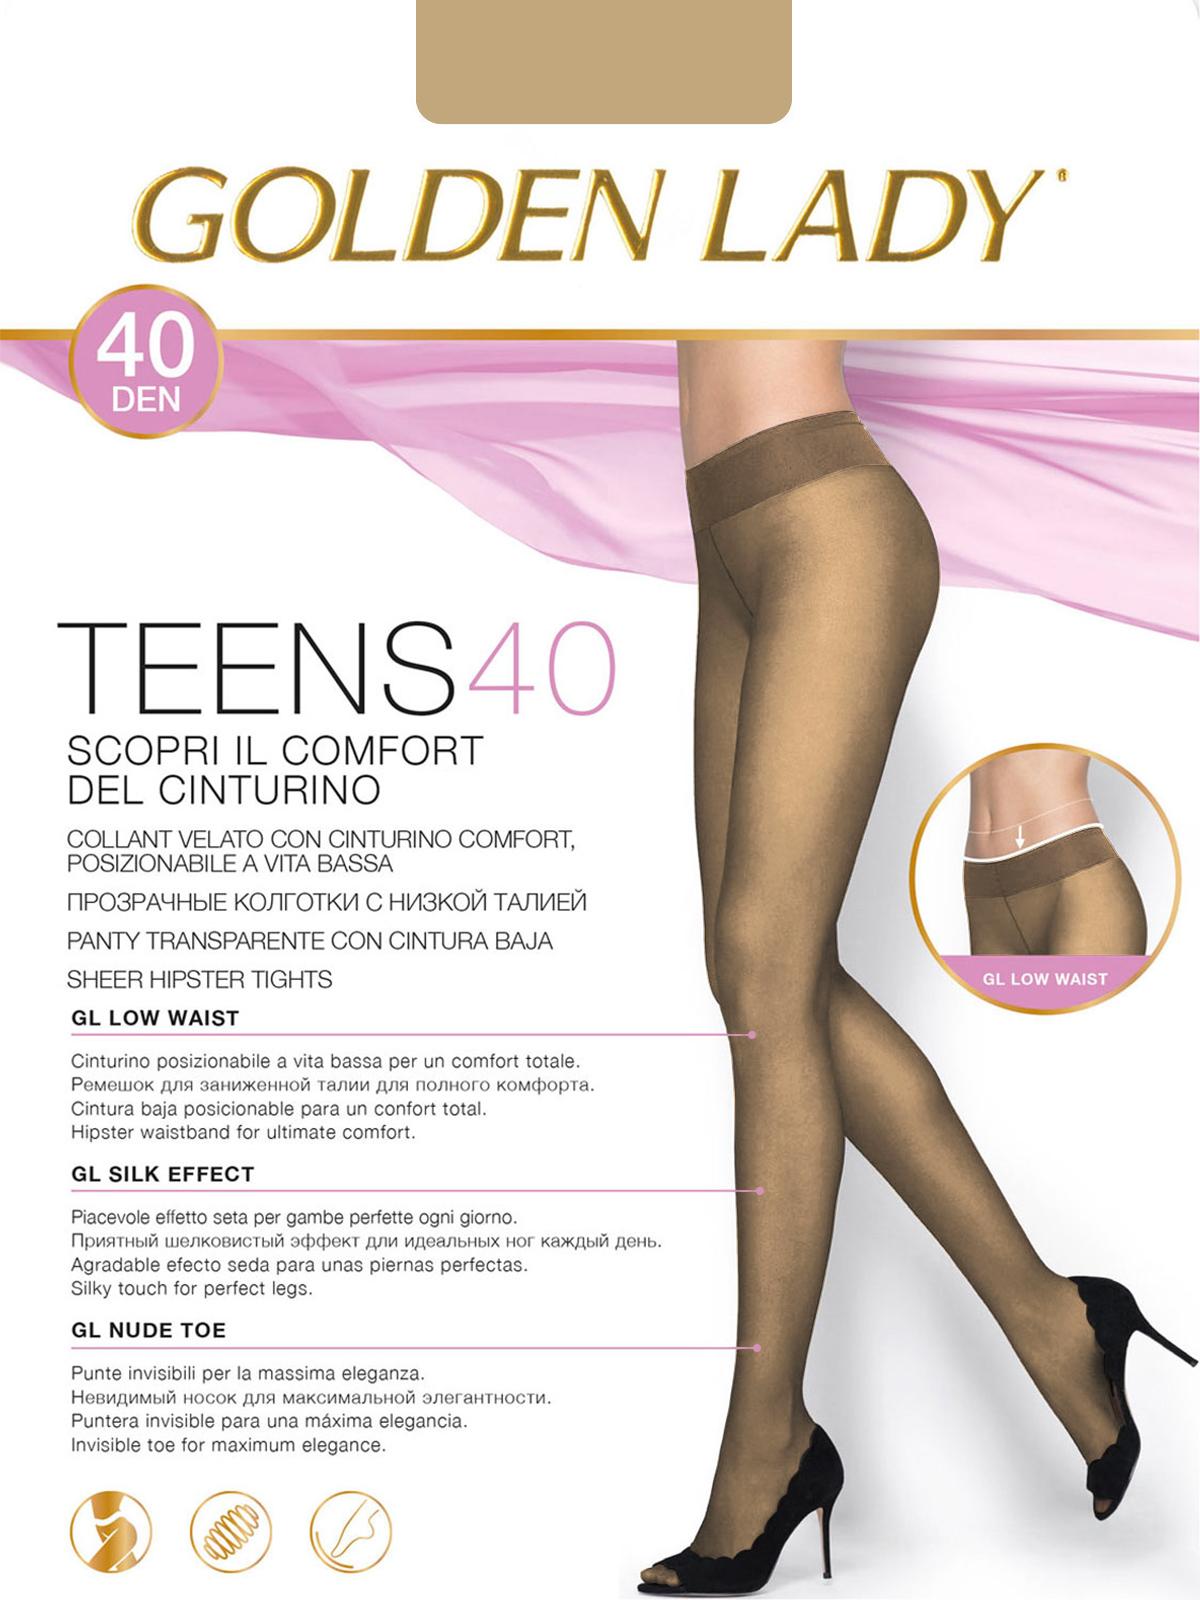 GOLDEN LADY TEENS 40 VITA BASSA